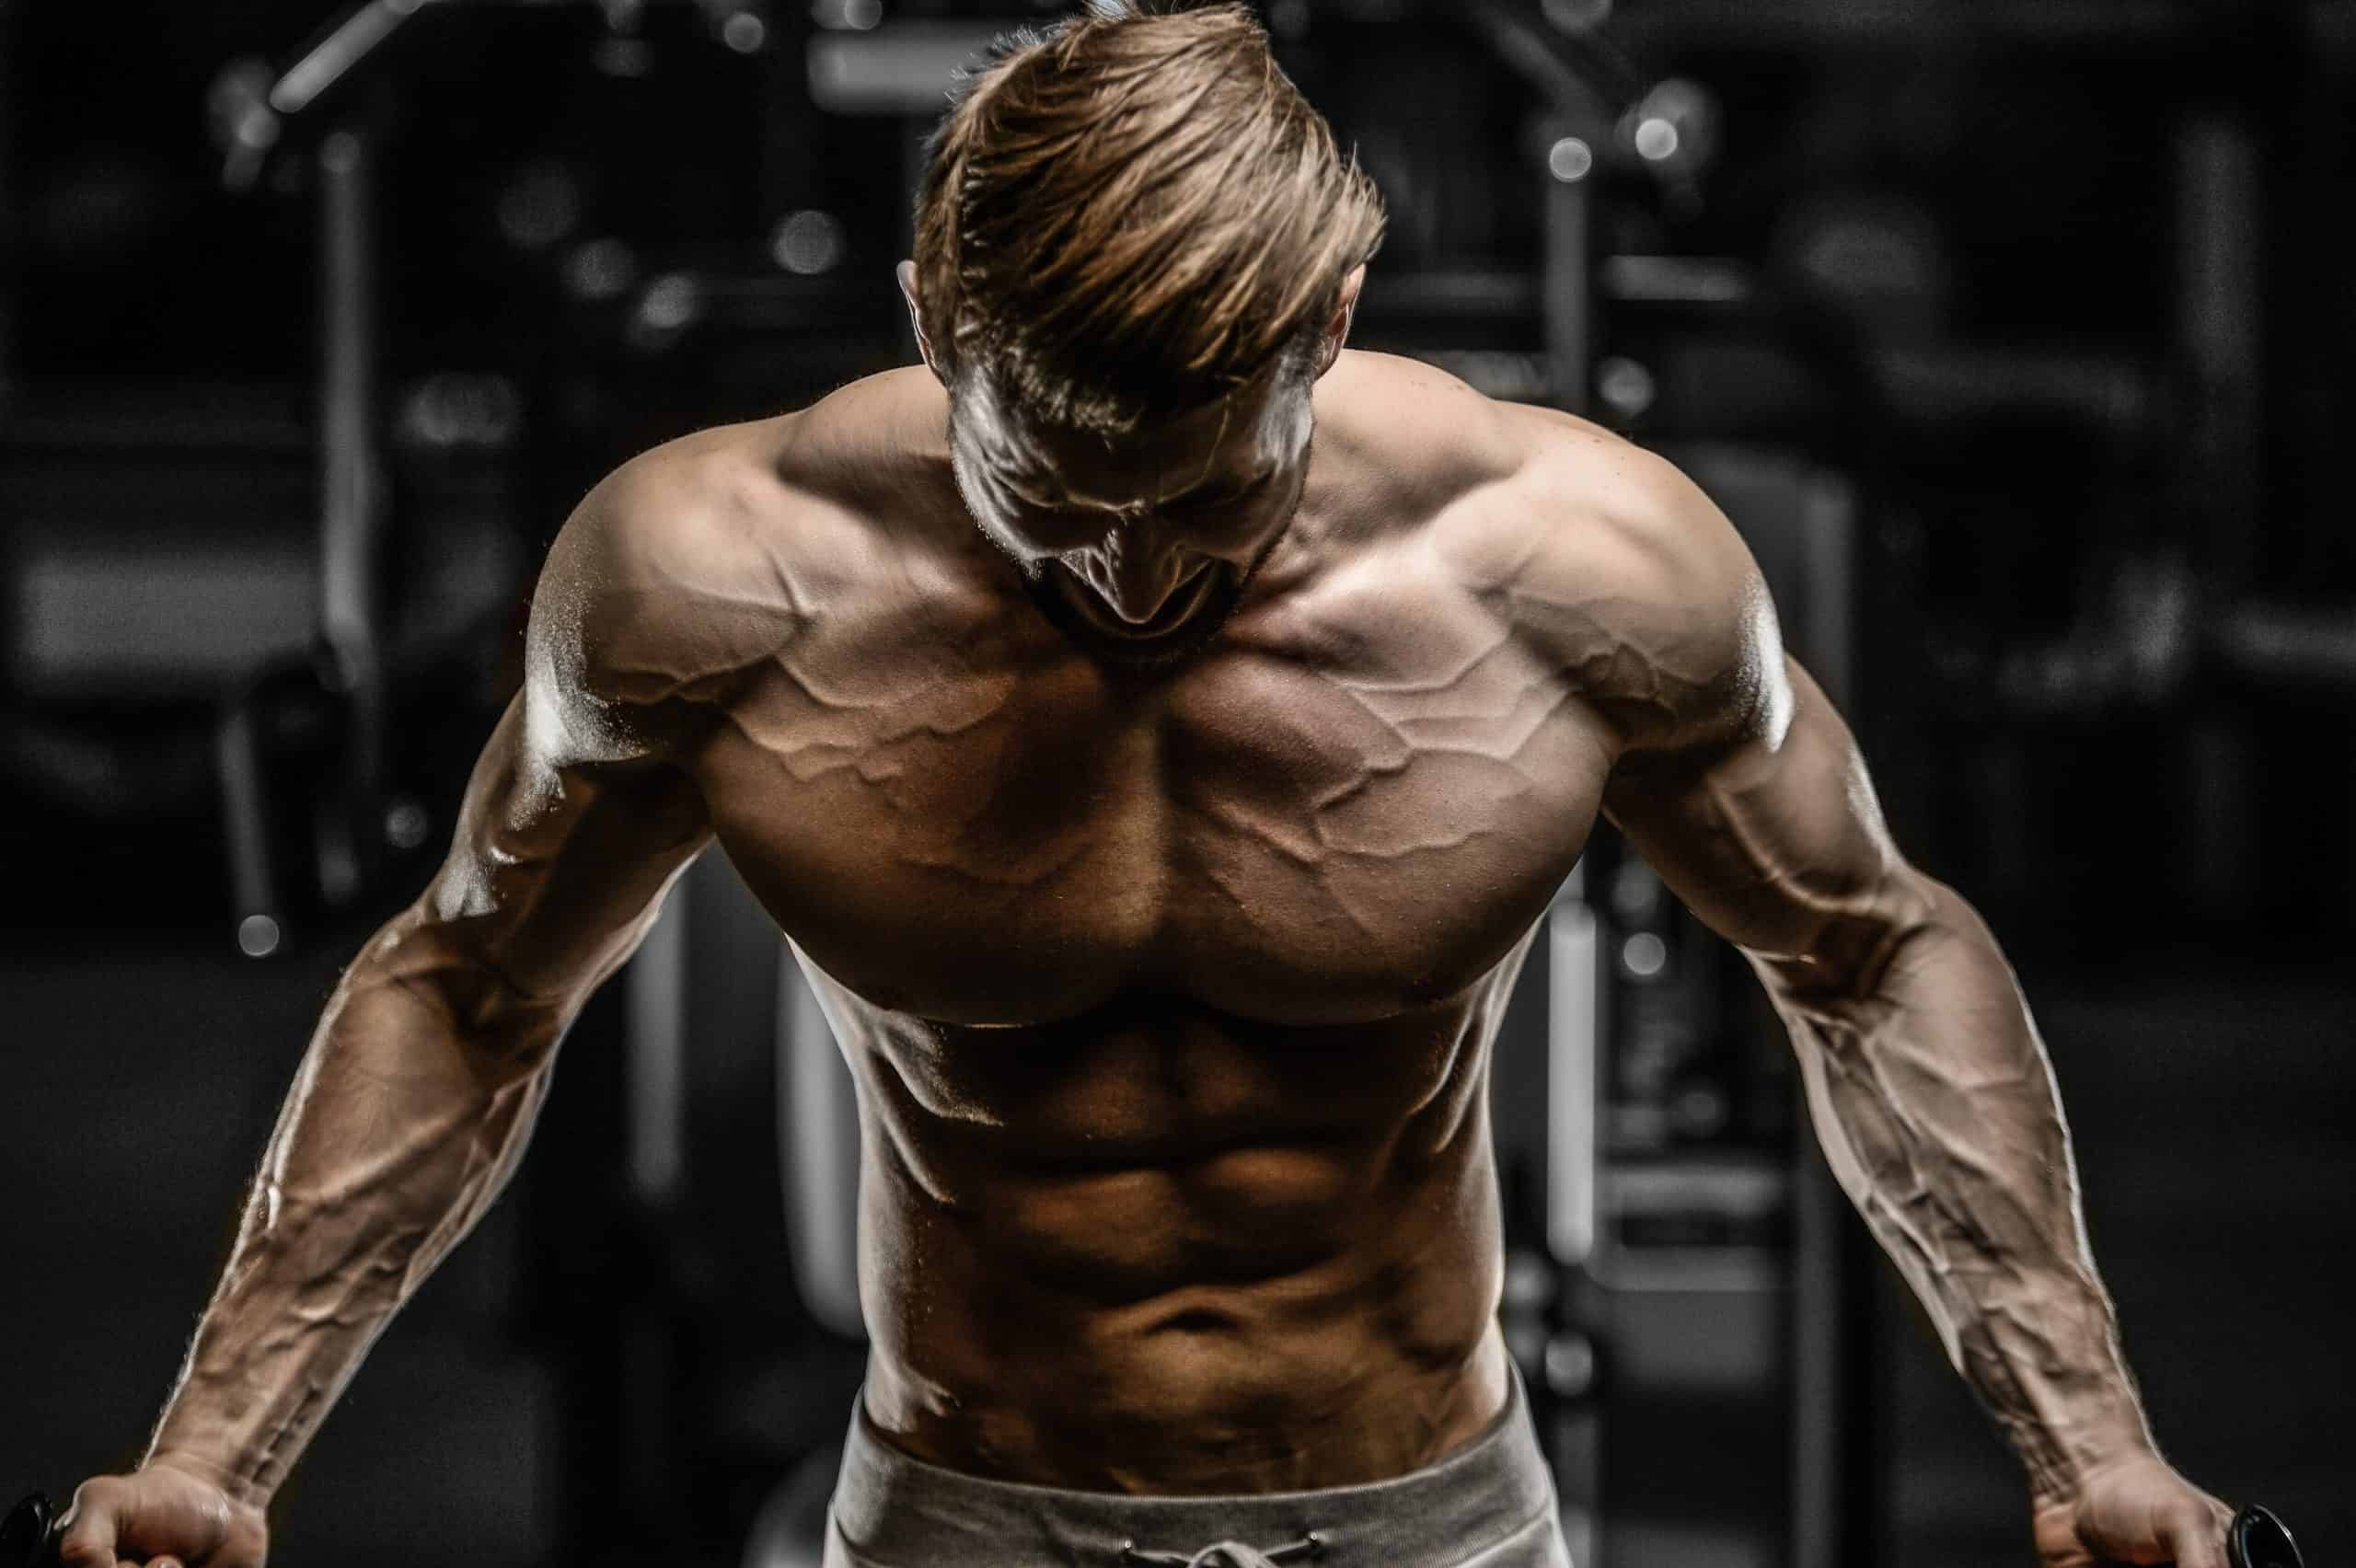 Sexy-Strong-Bodybuilder-Athlete